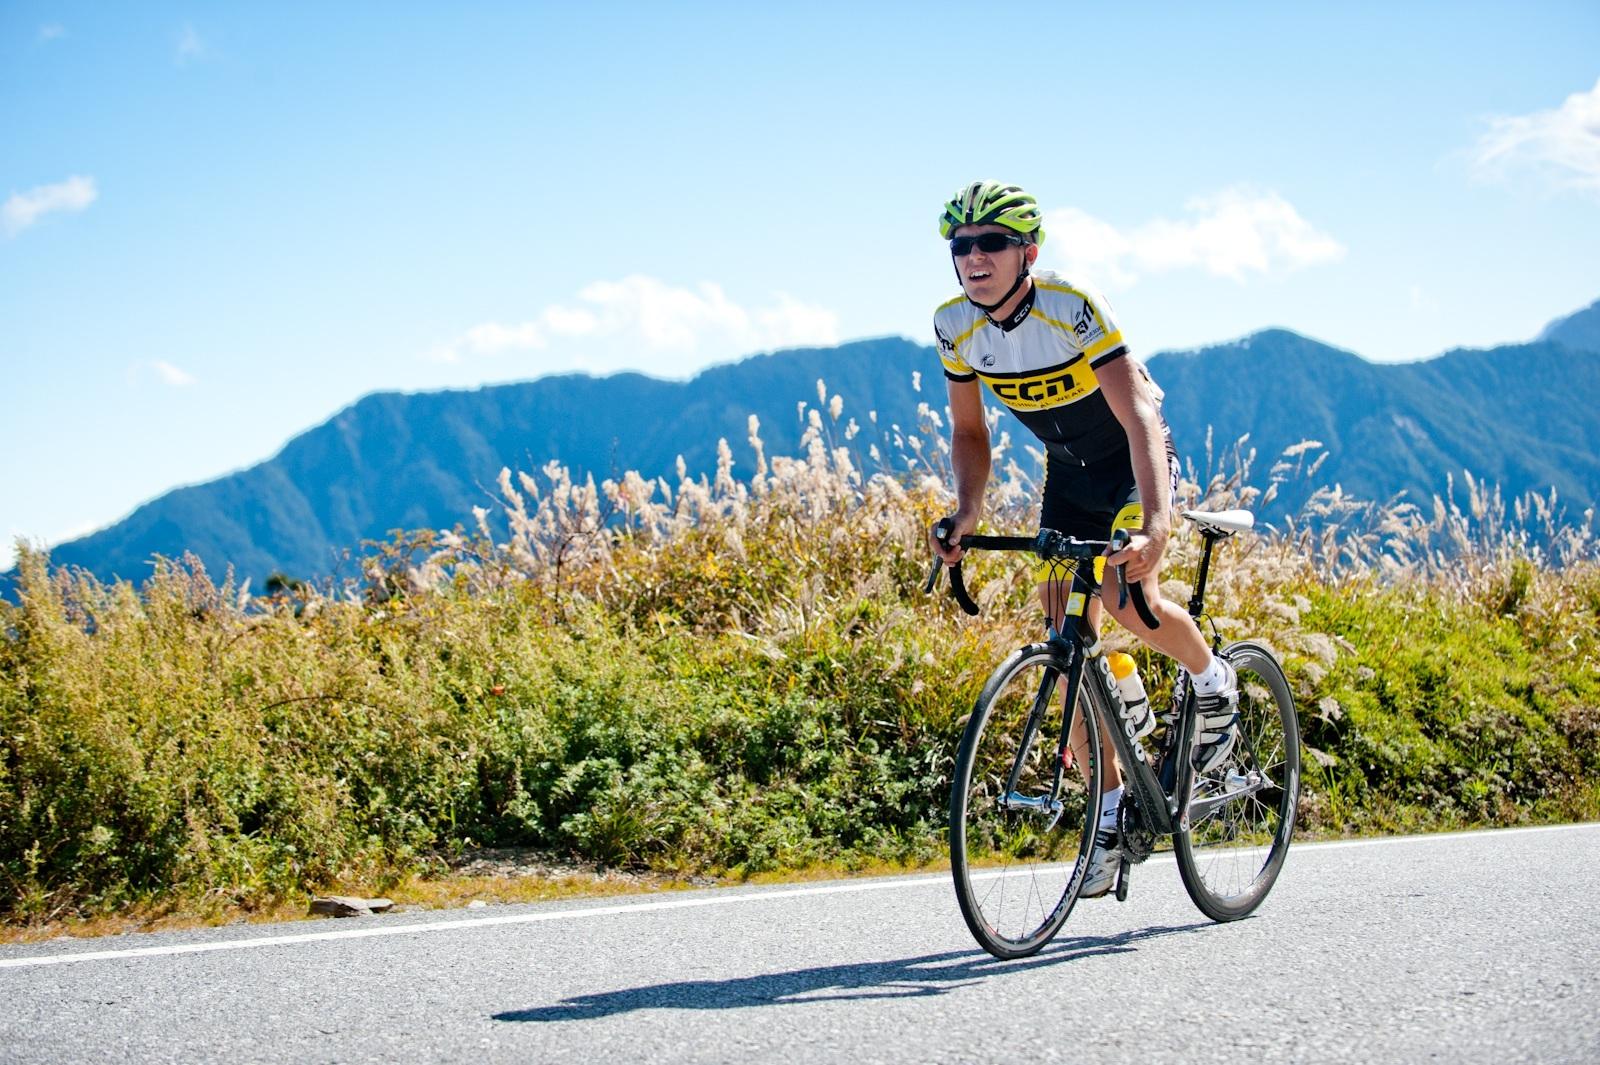 Taiwan KOM Challenge冠軍選手艾伯森對台灣公路經典路線留下深刻無比的印象